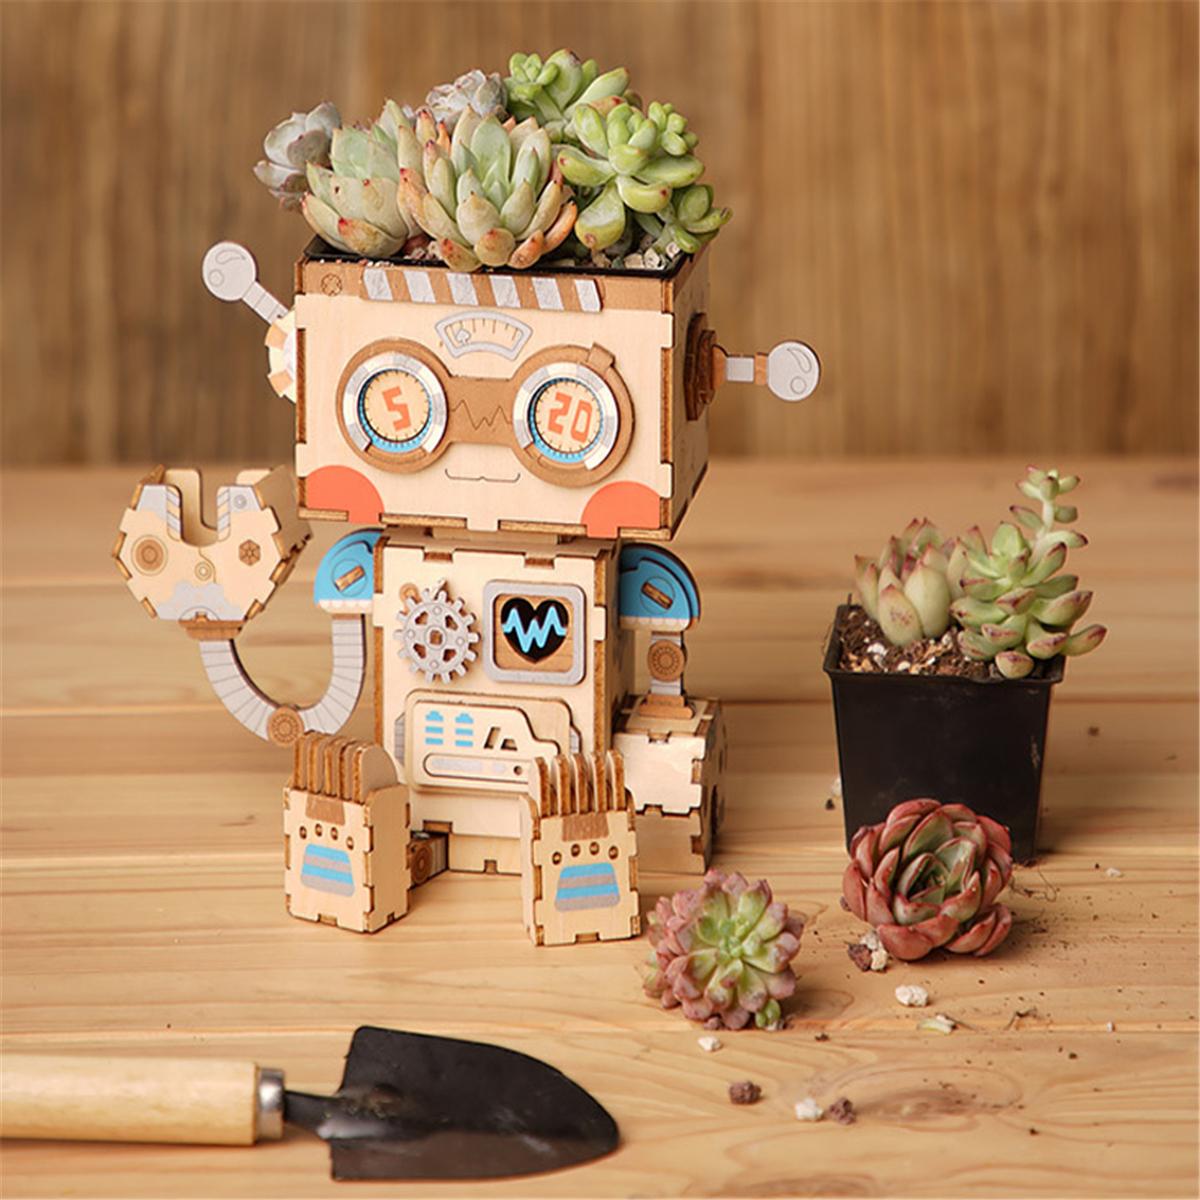 3D-DIY-Wooden-Puzzle-Flower-Pots-Animals-Model-Building-Kits-Toy-Gift-Kids-UK thumbnail 4